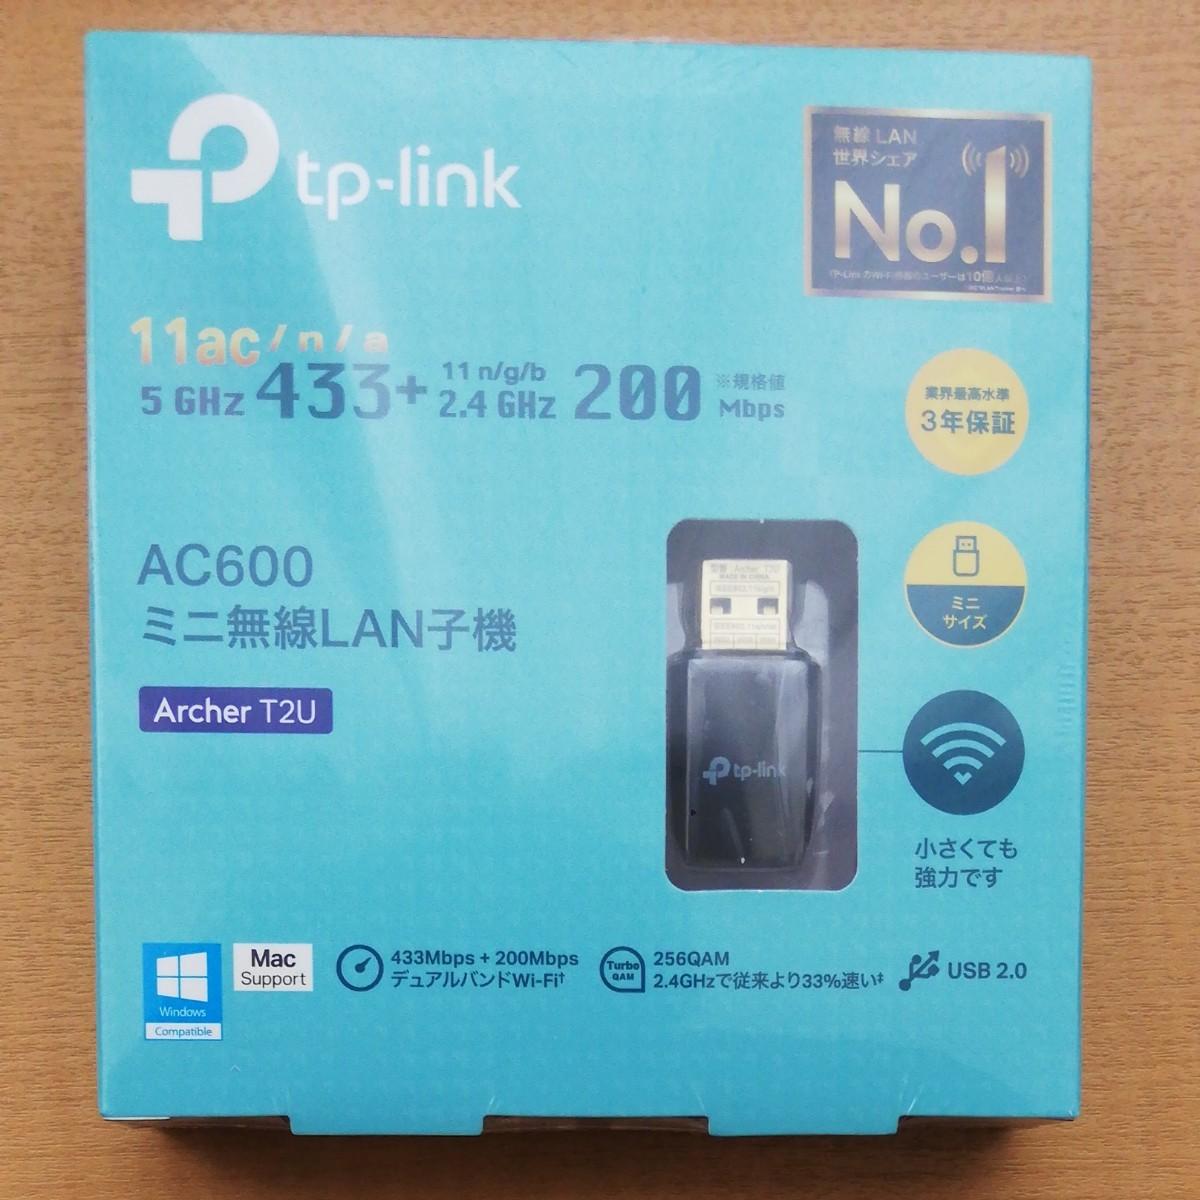 ミニ無線LAN子機AC600